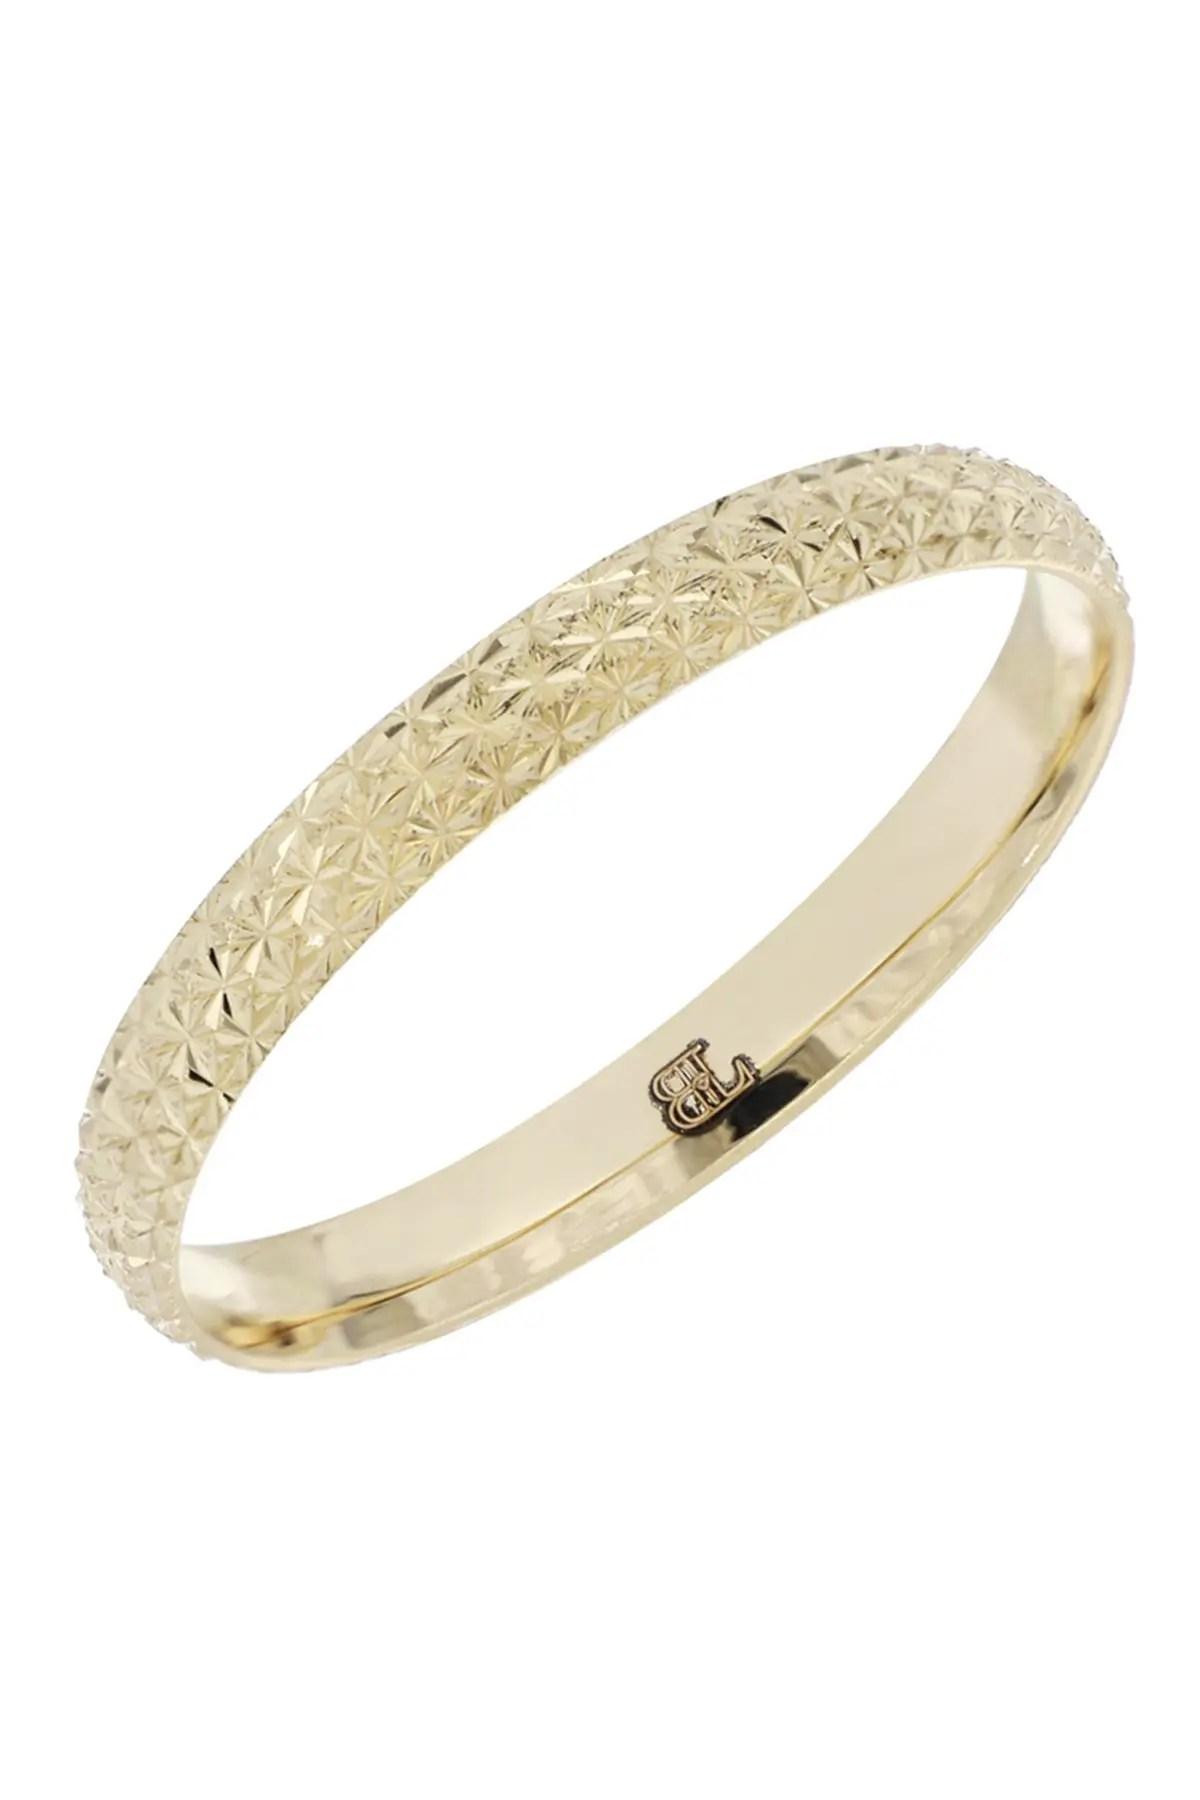 bony levy 14k yellow gold diamond cut band nordstrom rack